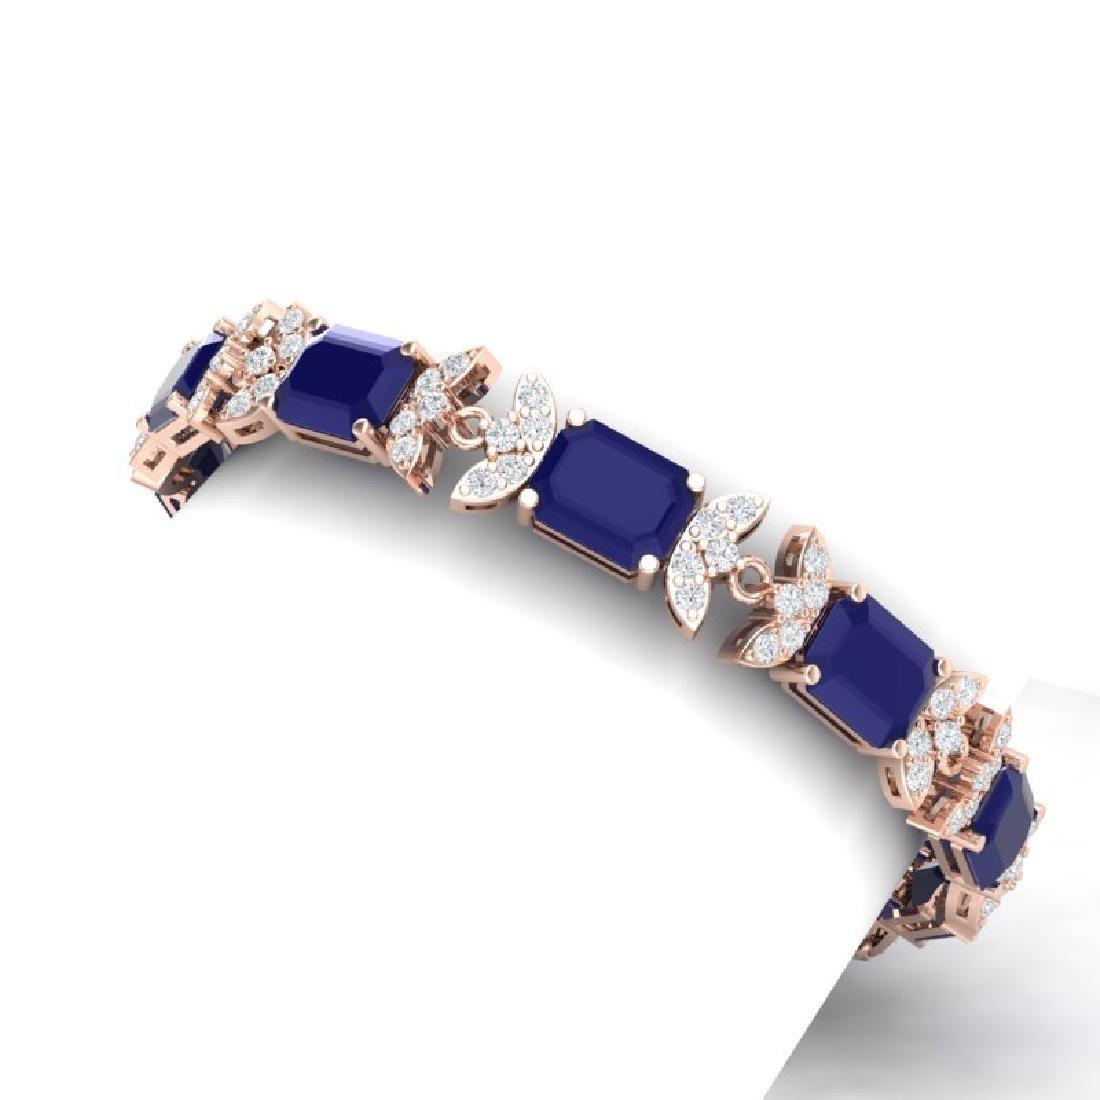 38.13 CTW Royalty Sapphire & VS Diamond Bracelet 18K - 2